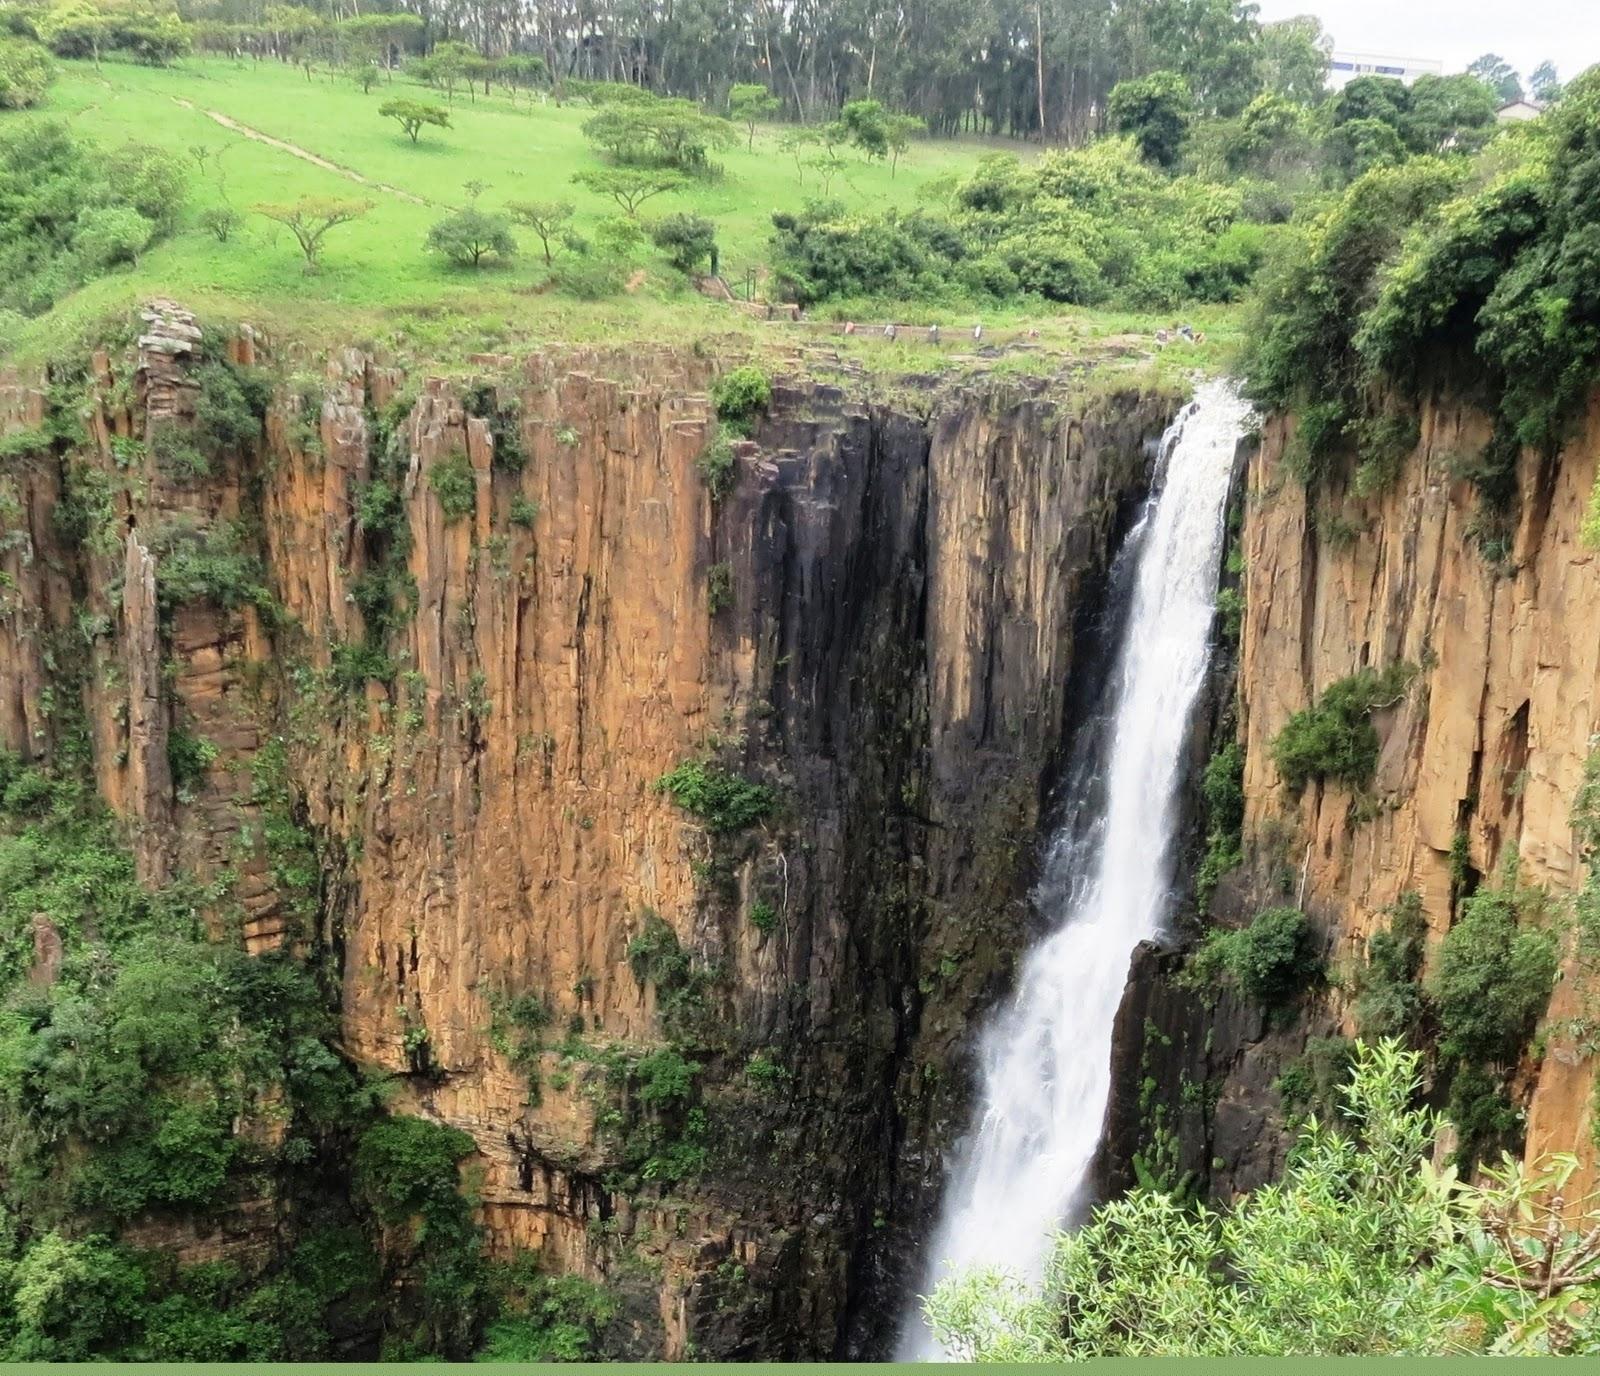 Howick Falls in Kwazulu Natal